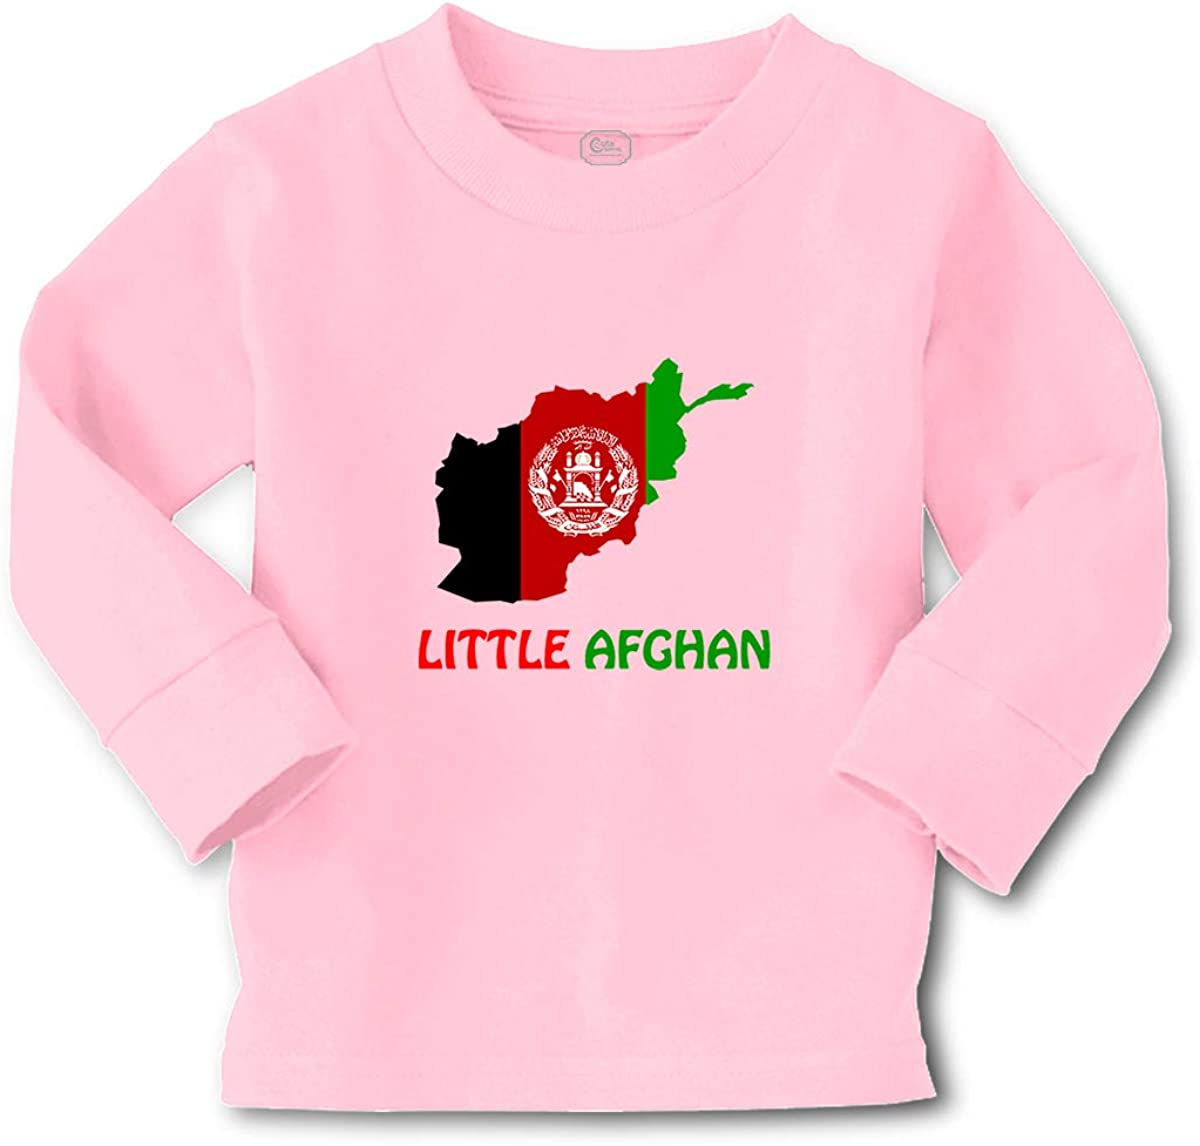 Cute Rascals Kids Long Sleeve T Shirt Little Afghan Countries Cotton Boy & Girl Clothes